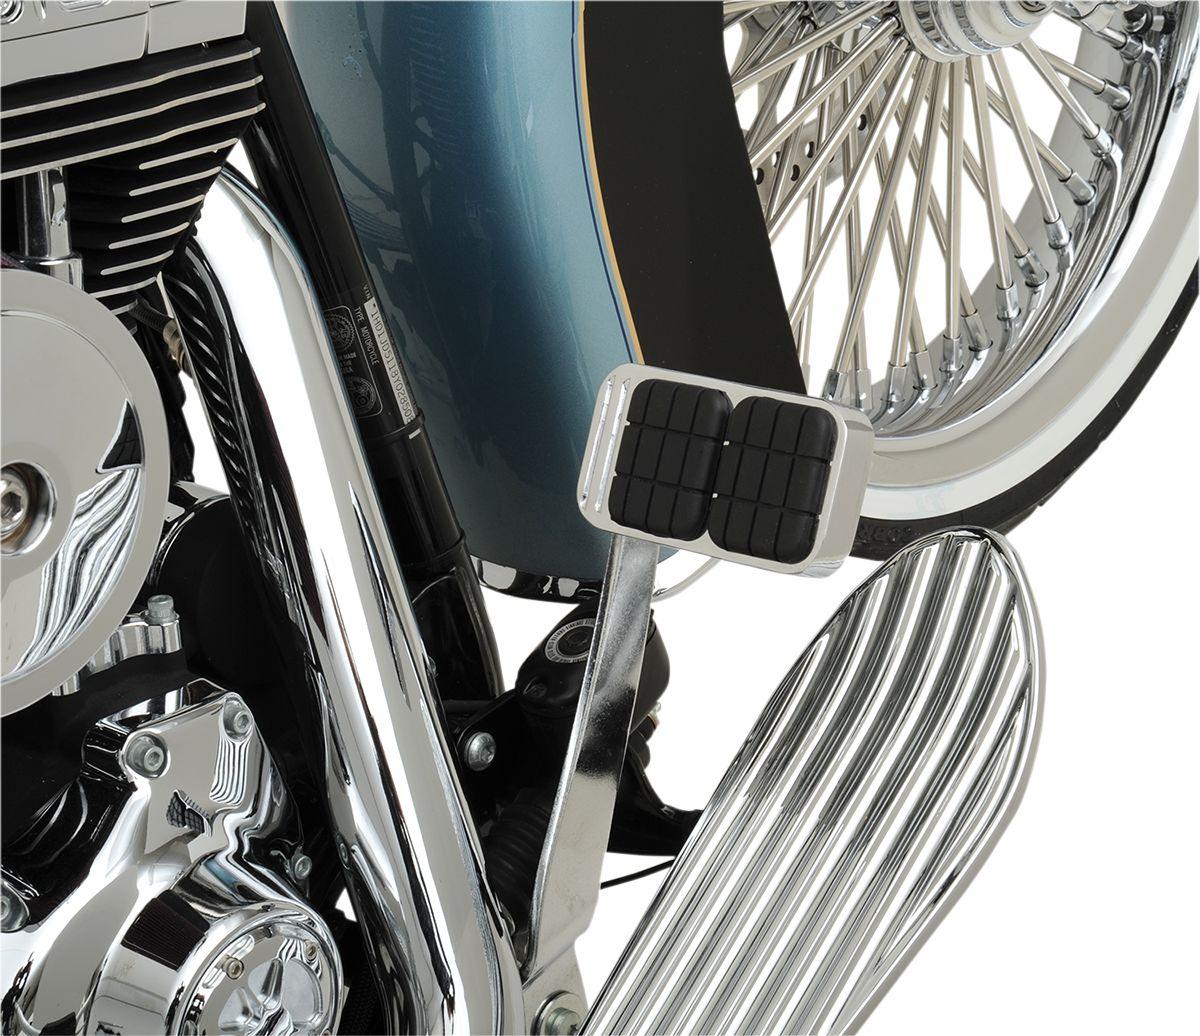 【Drag Specialties】煞車踏板總成/83-13FLT FLST用 【BRK PD ASSY 83-13FLT FLST [DS-241072]】 - 「Webike-摩托百貨」